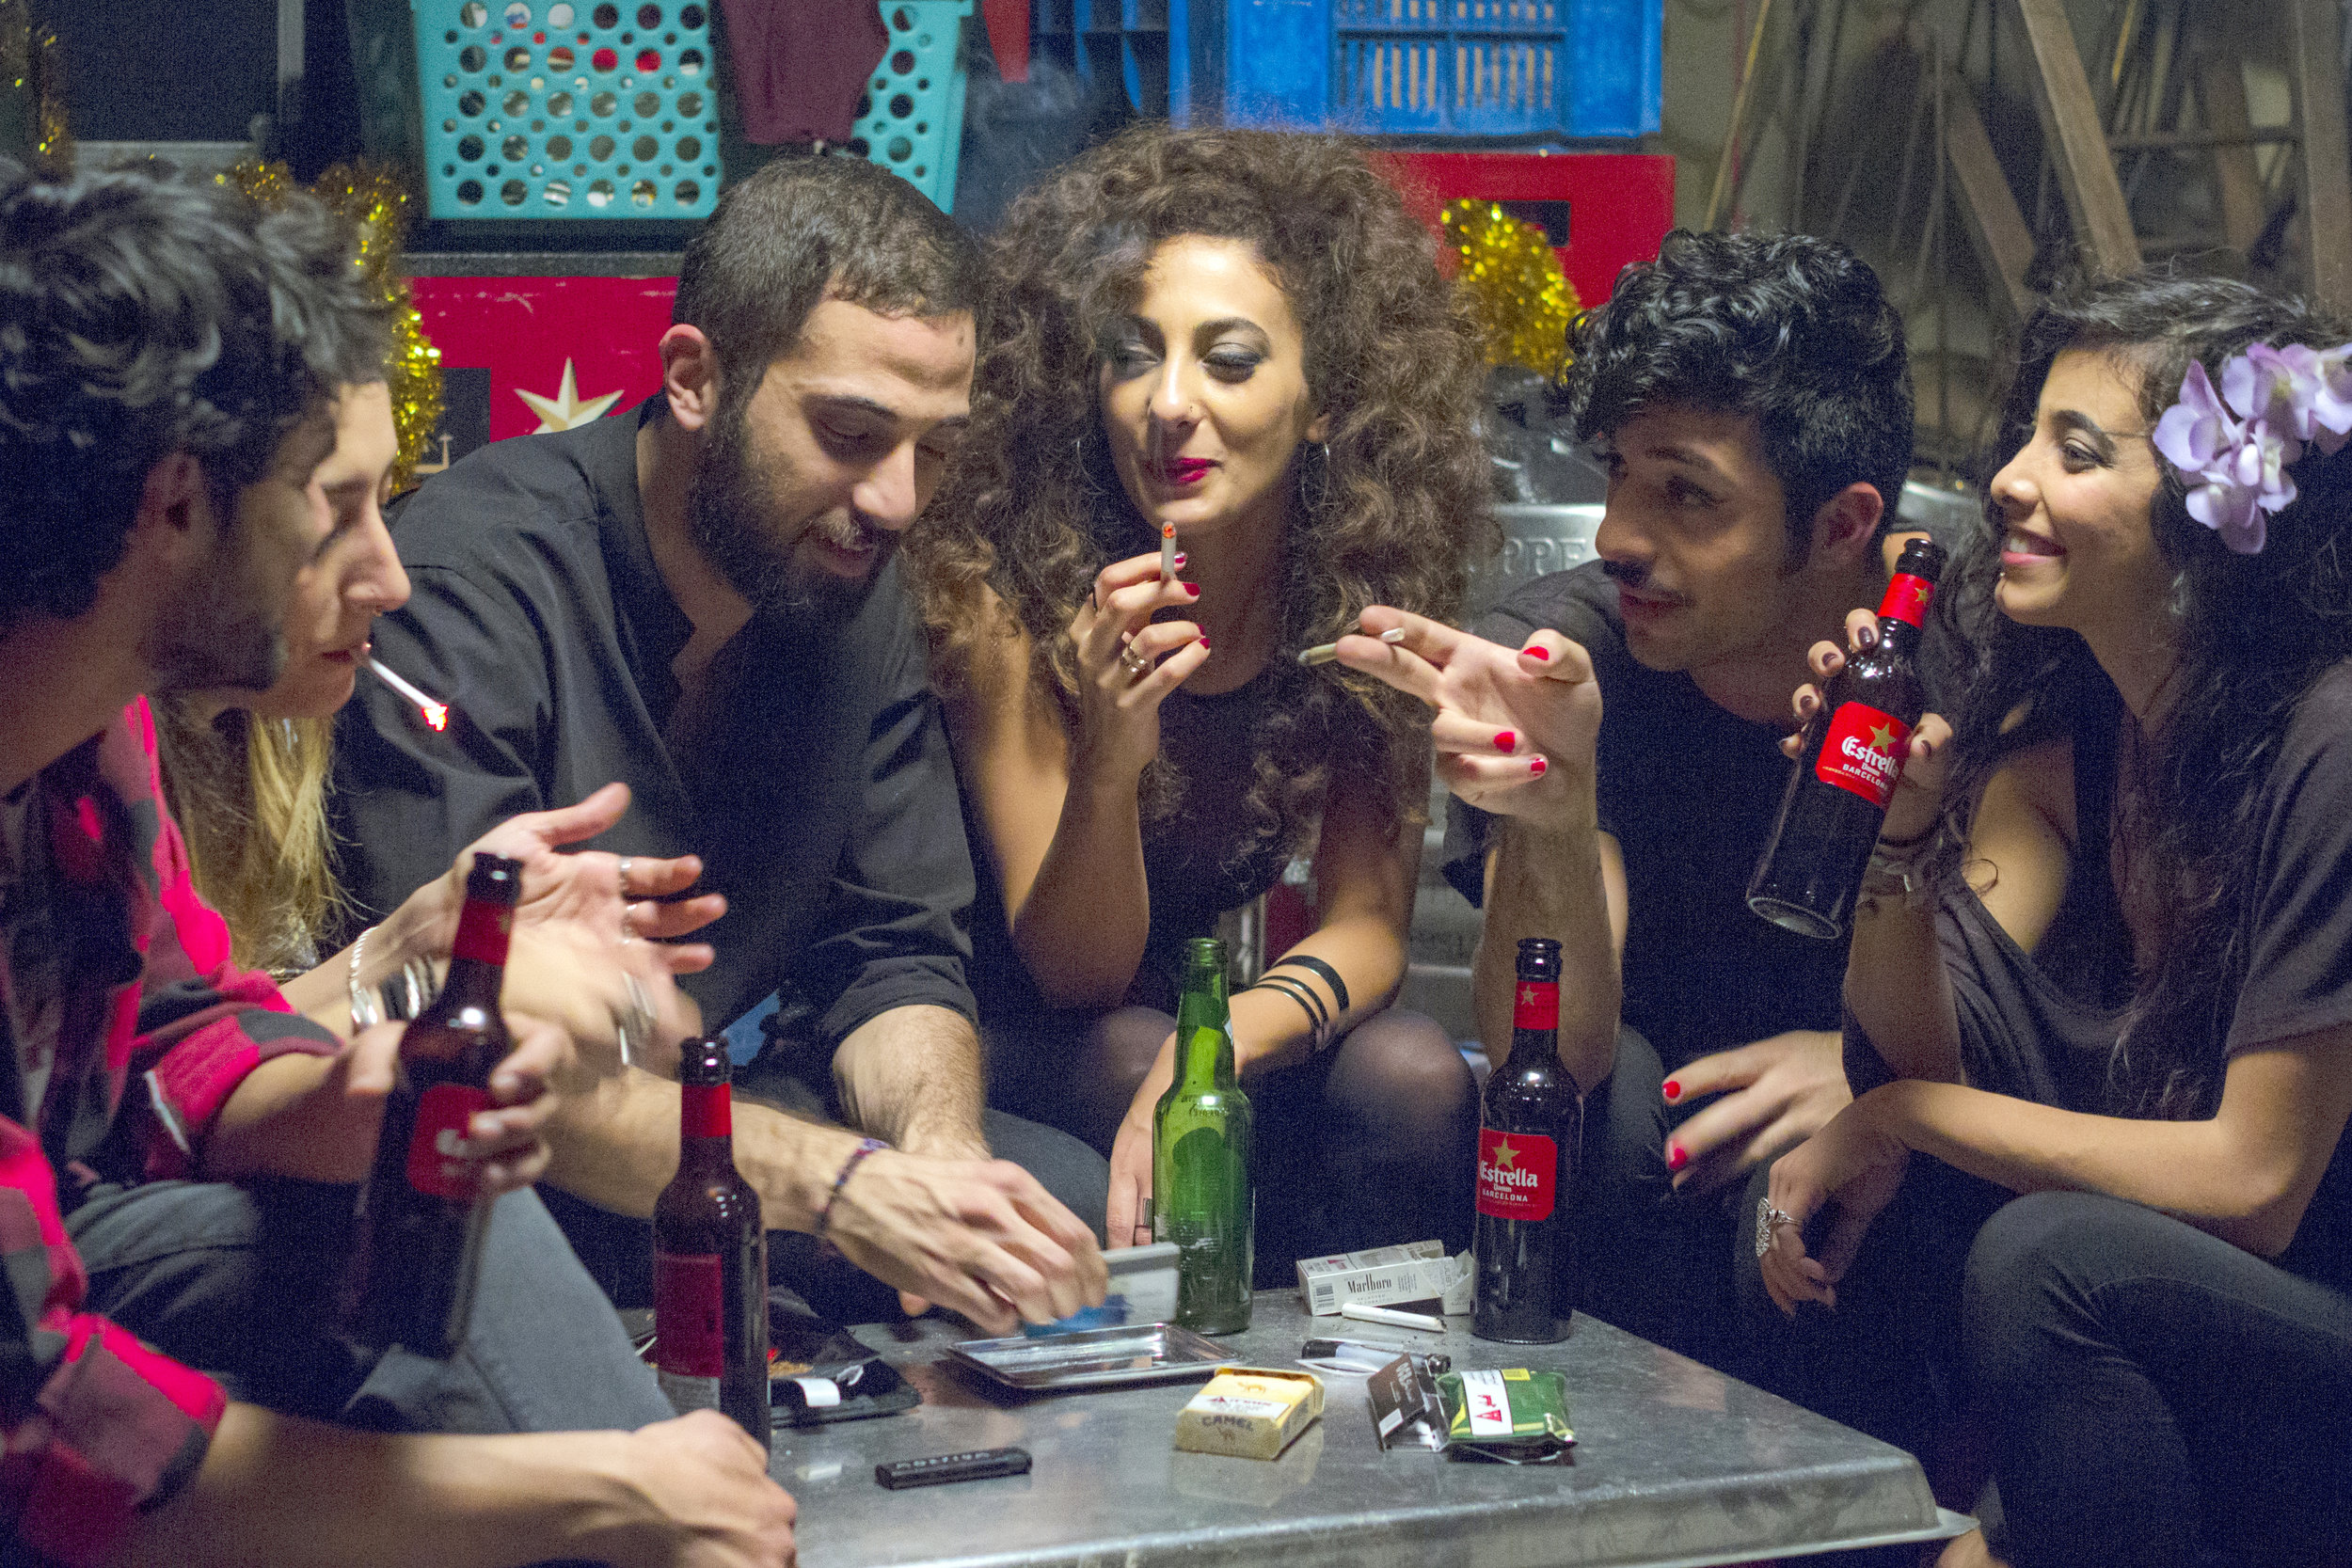 In Between  directed by Maysaloun Hamoud